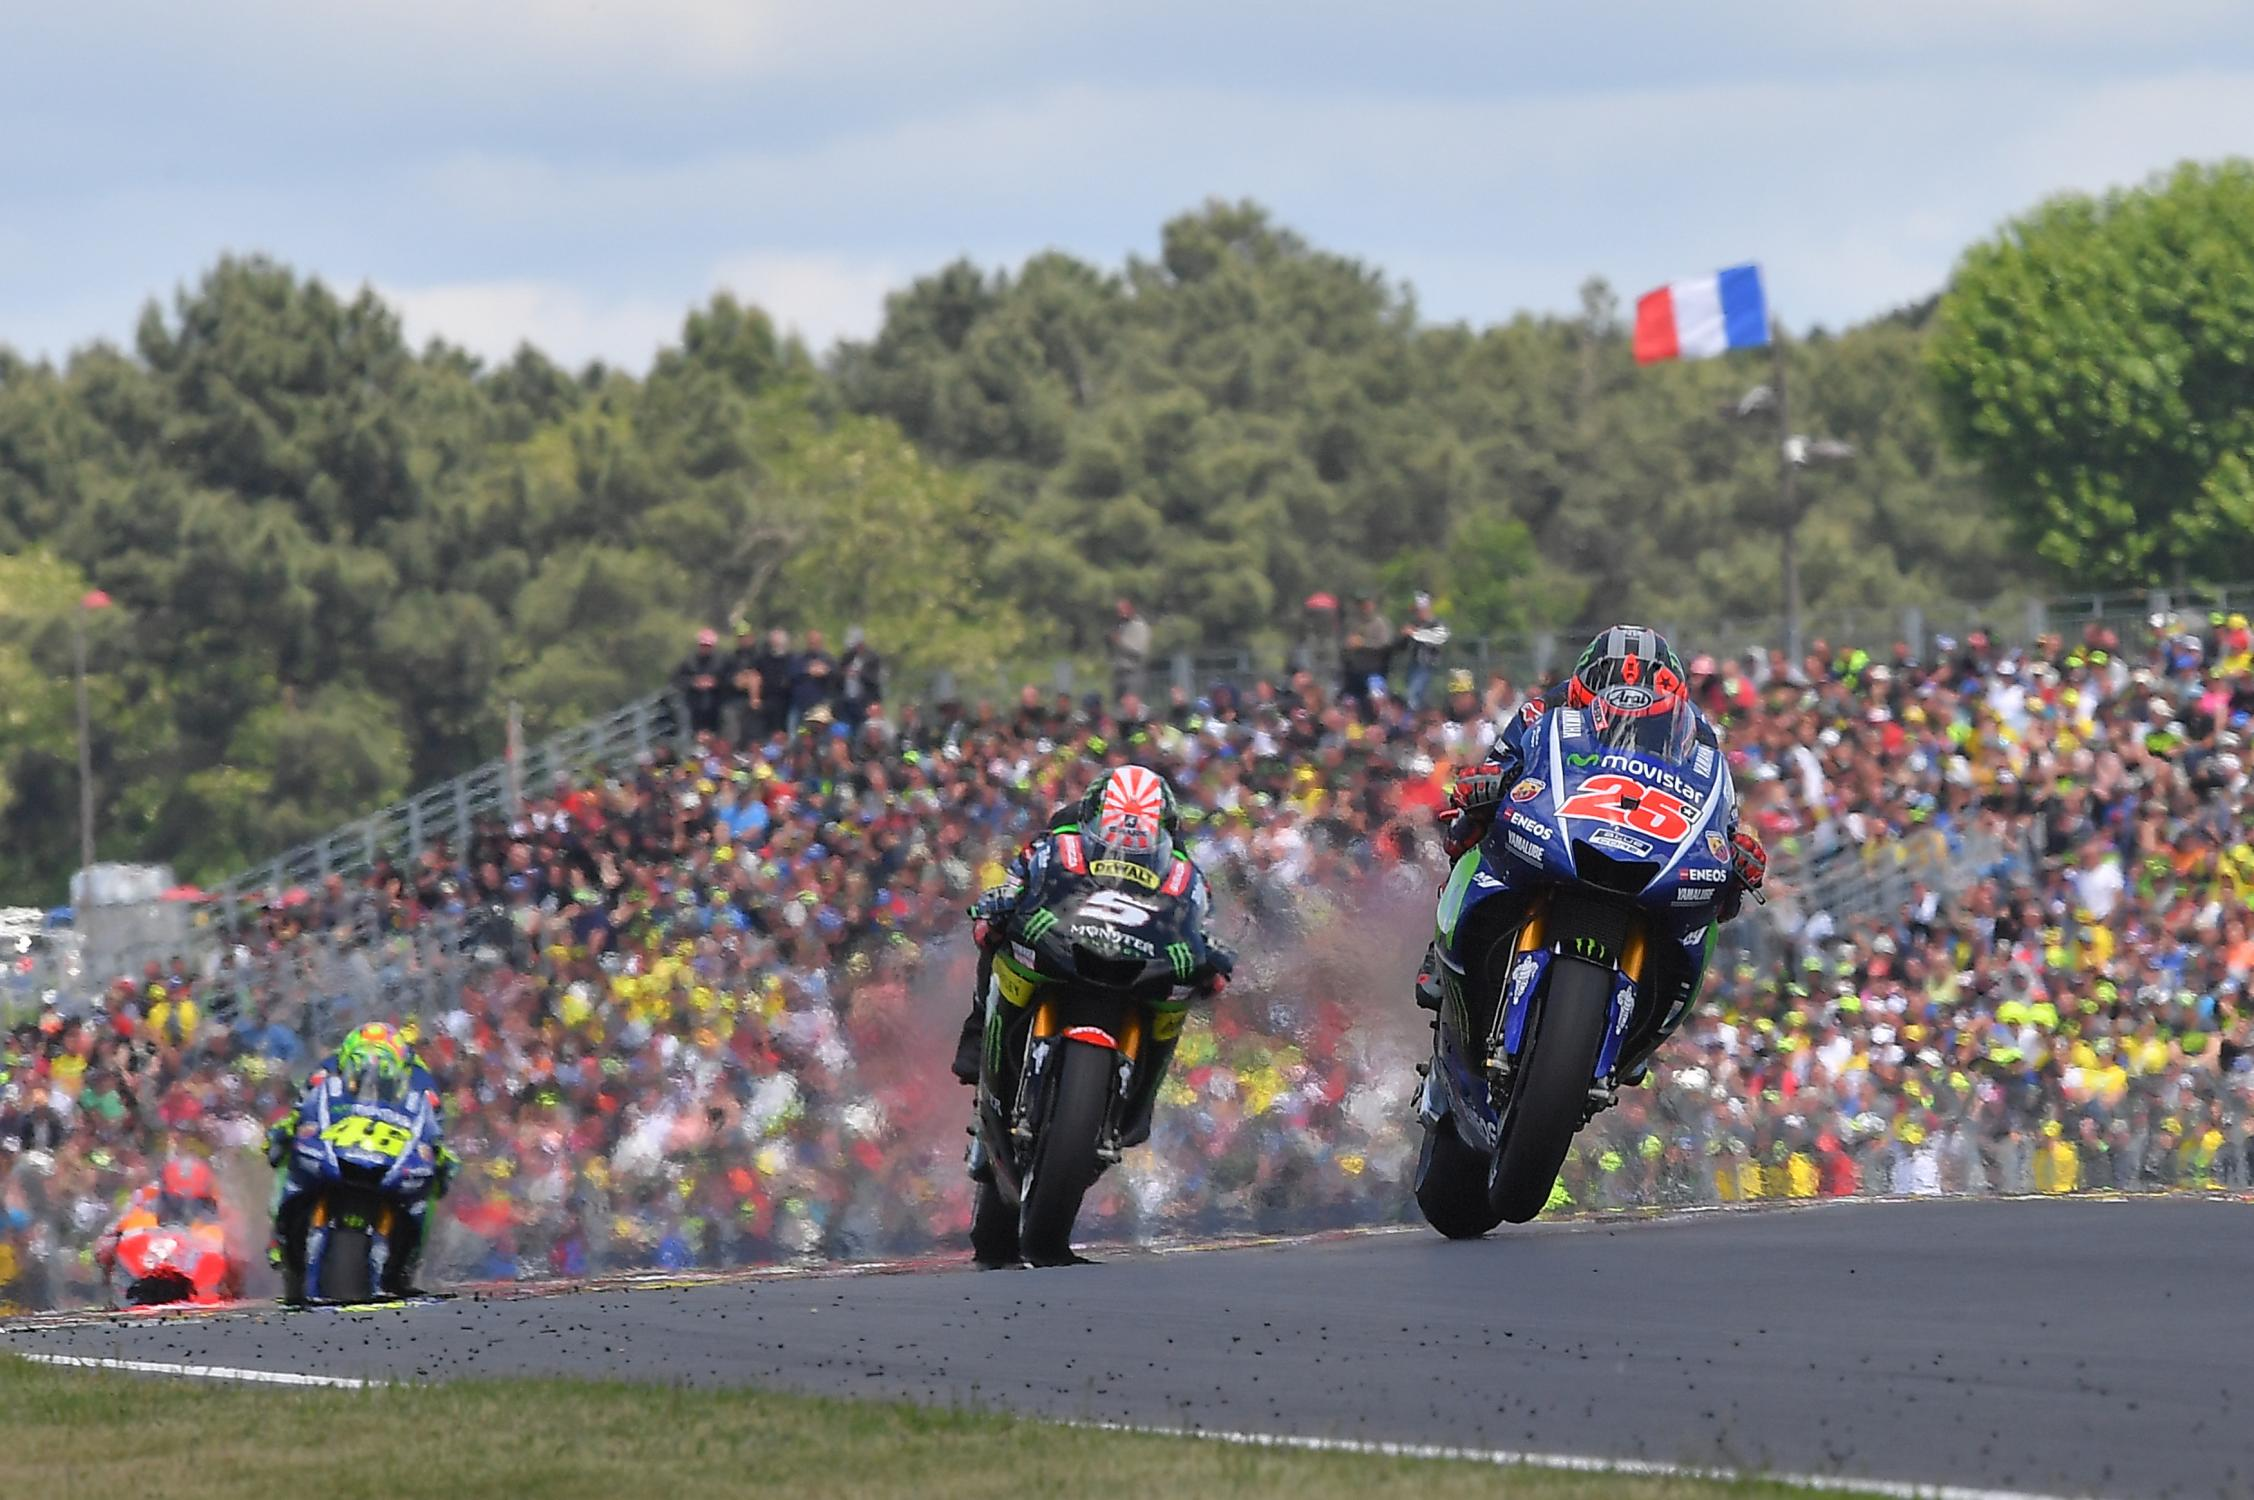 [GP] Le Mans 5ng_3499.gallery_full_top_fullscreen